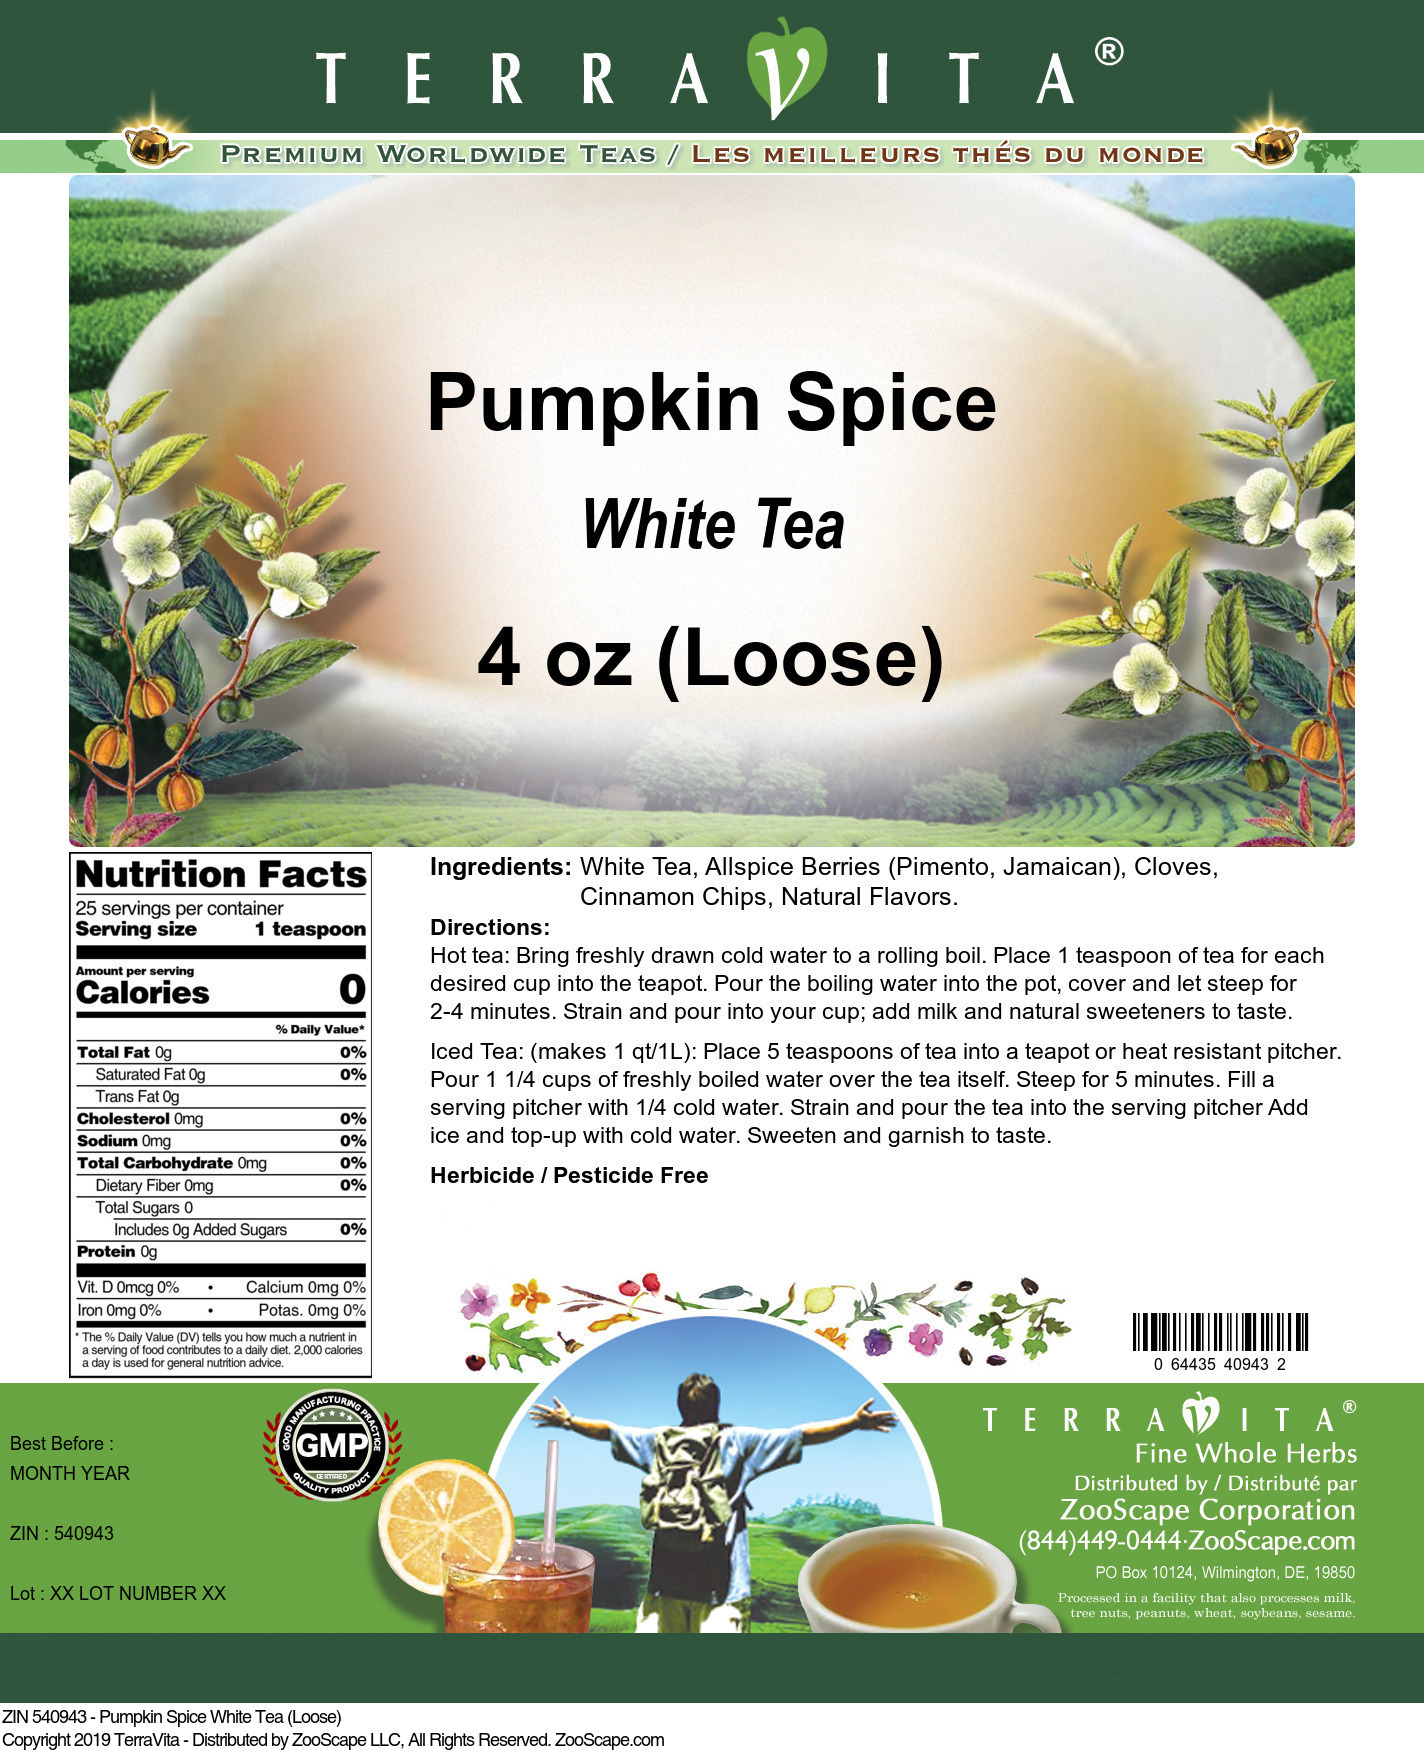 Pumpkin Spice White Tea (Loose)